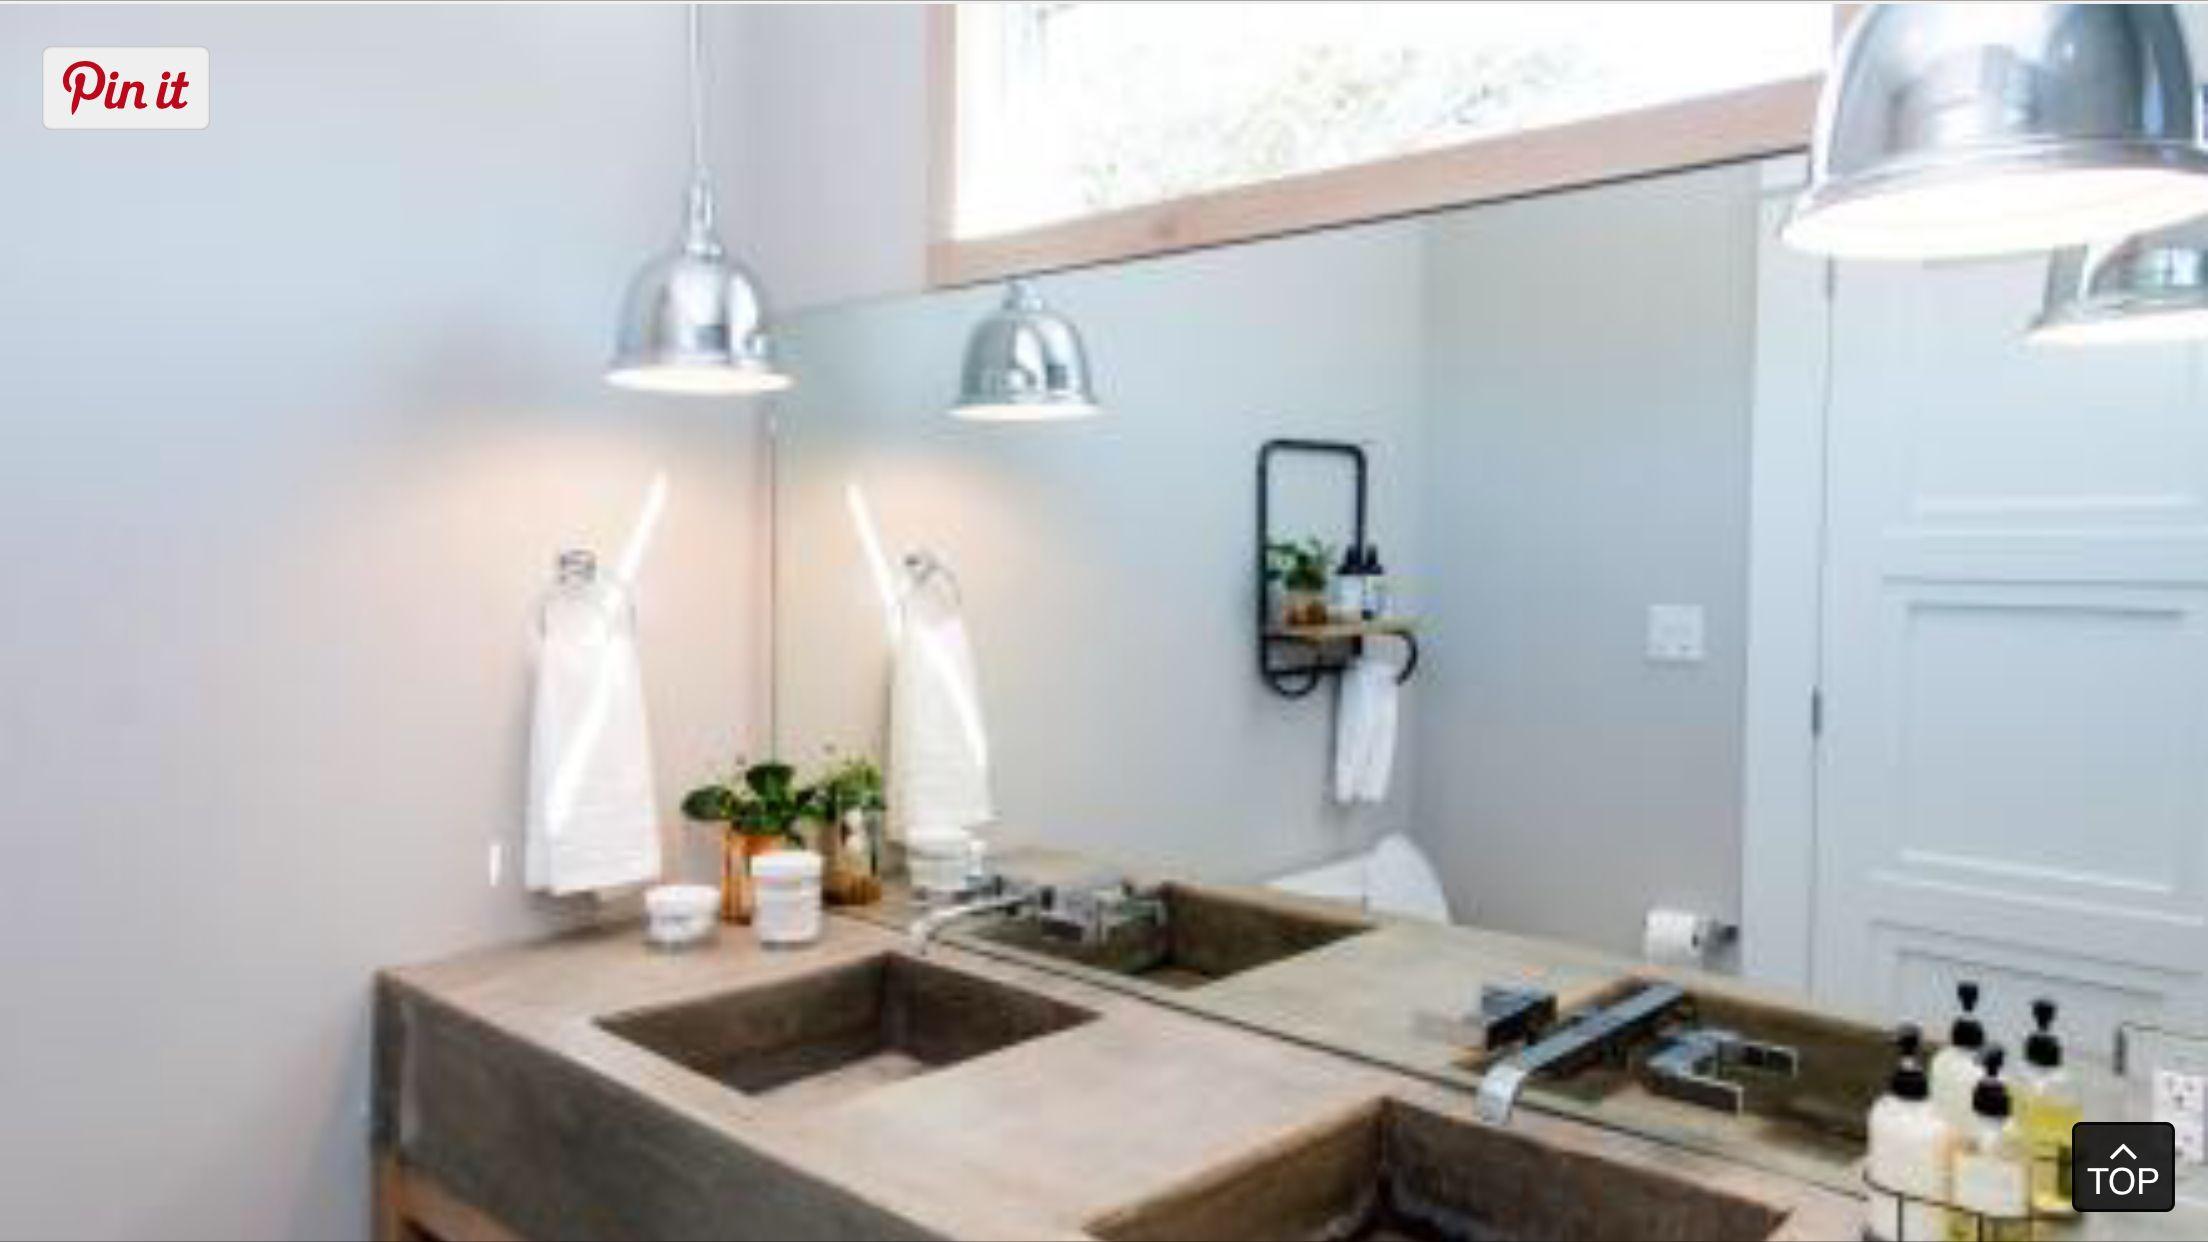 Fixer upper shotgun tiny house formed concrete sinks master bathroom ...